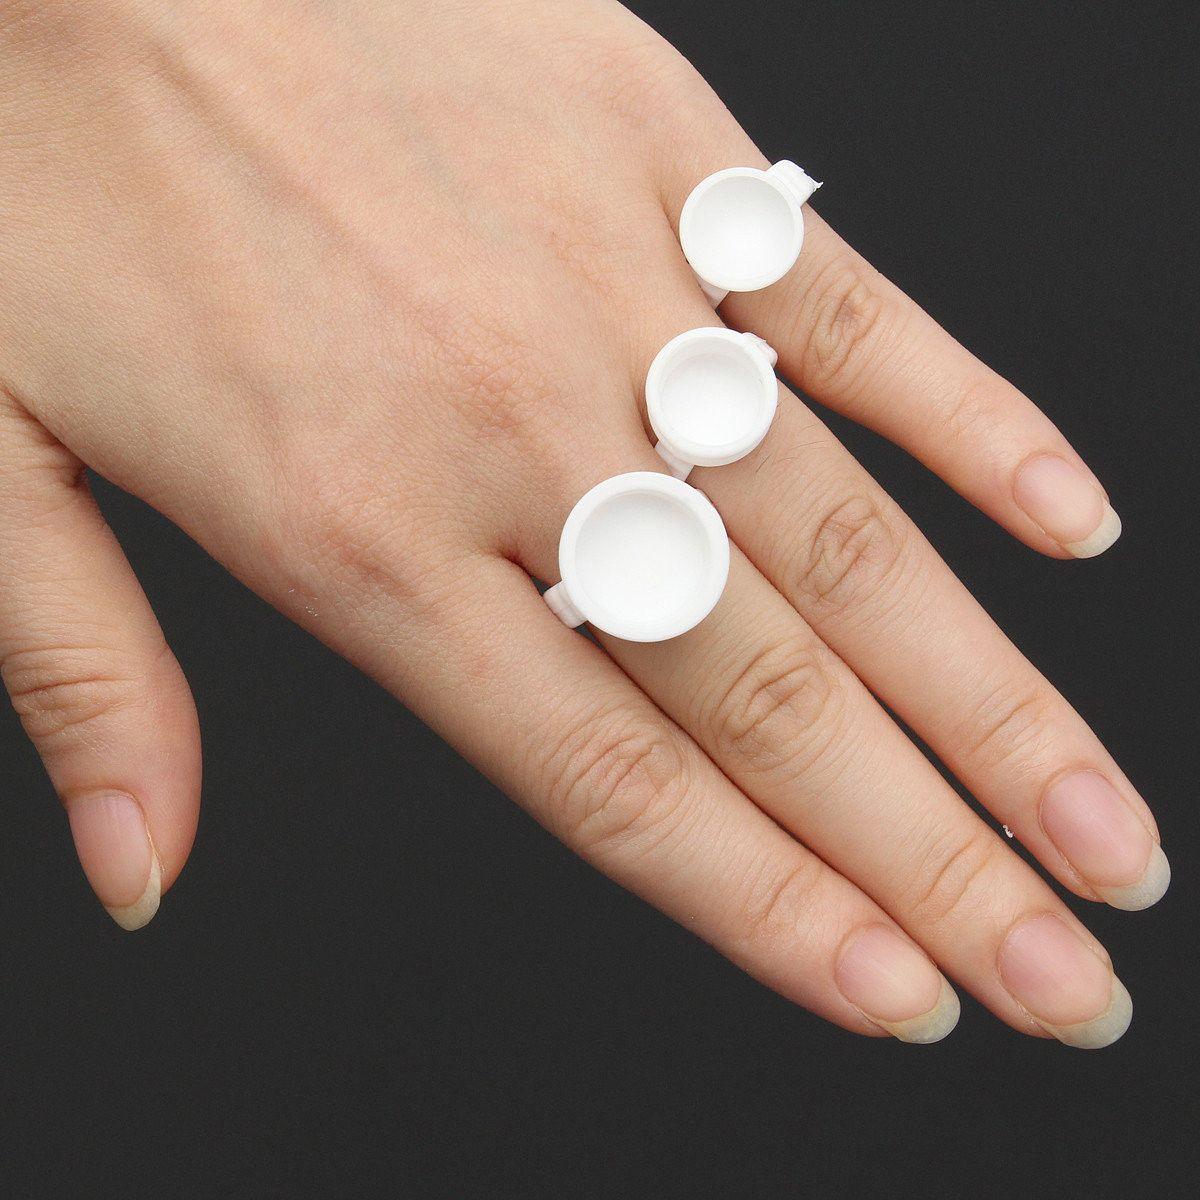 10Pcs White Plastic Ring Ink Tattoo Cups Tattoo Supplies